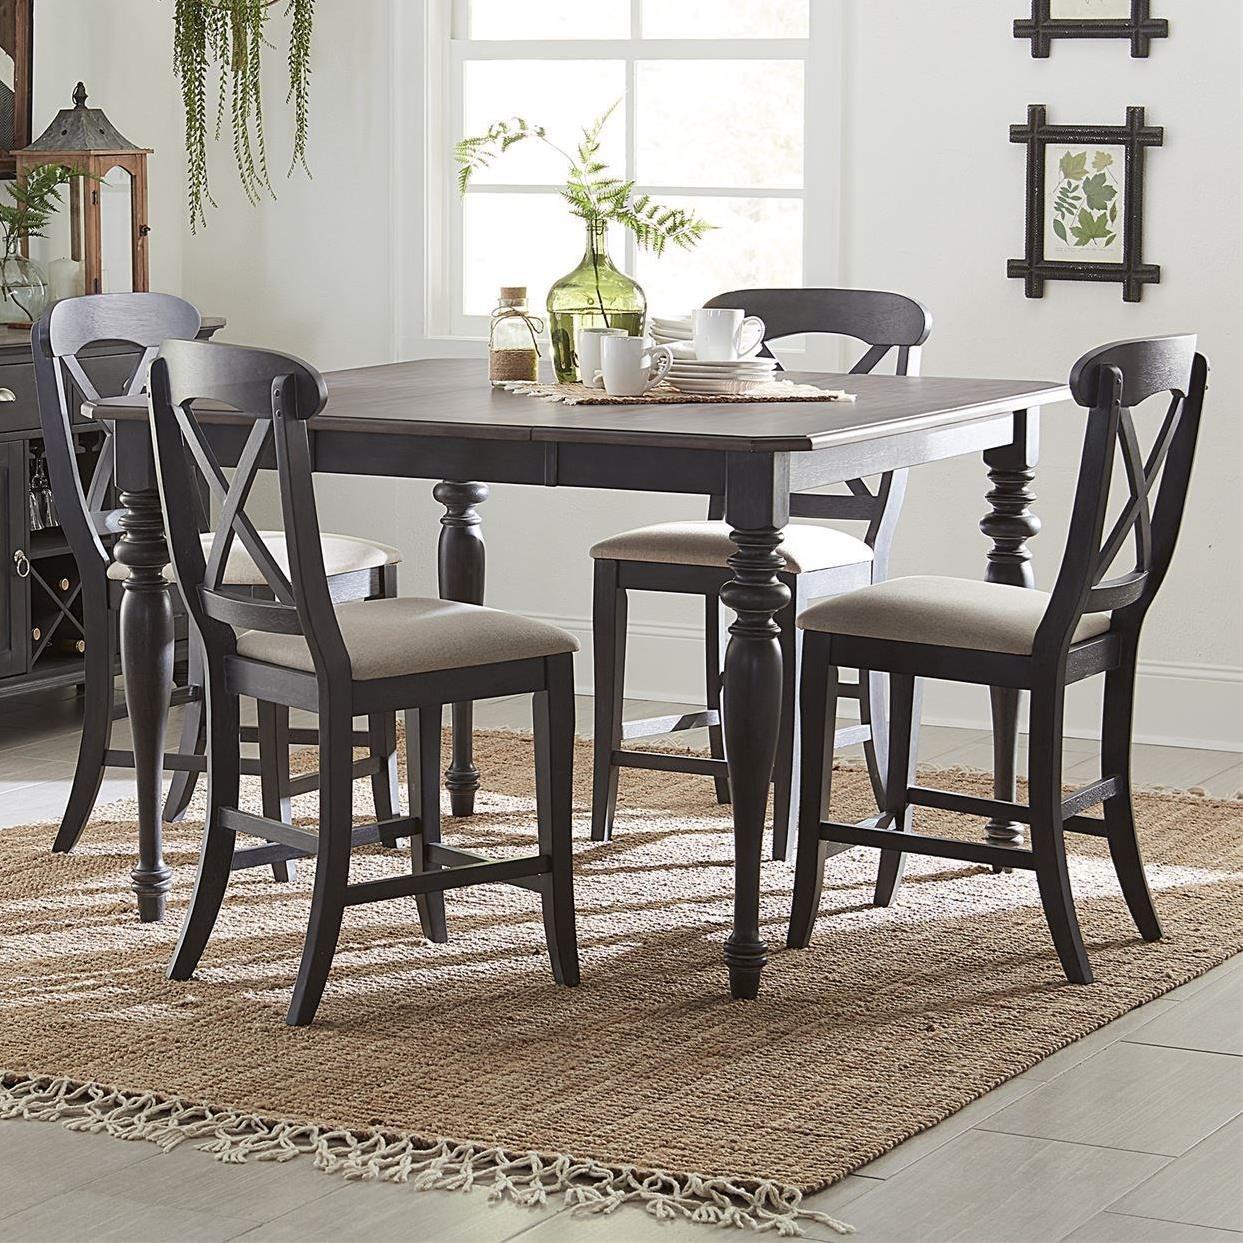 Cottage Style 5-Piece Gathering Table Set